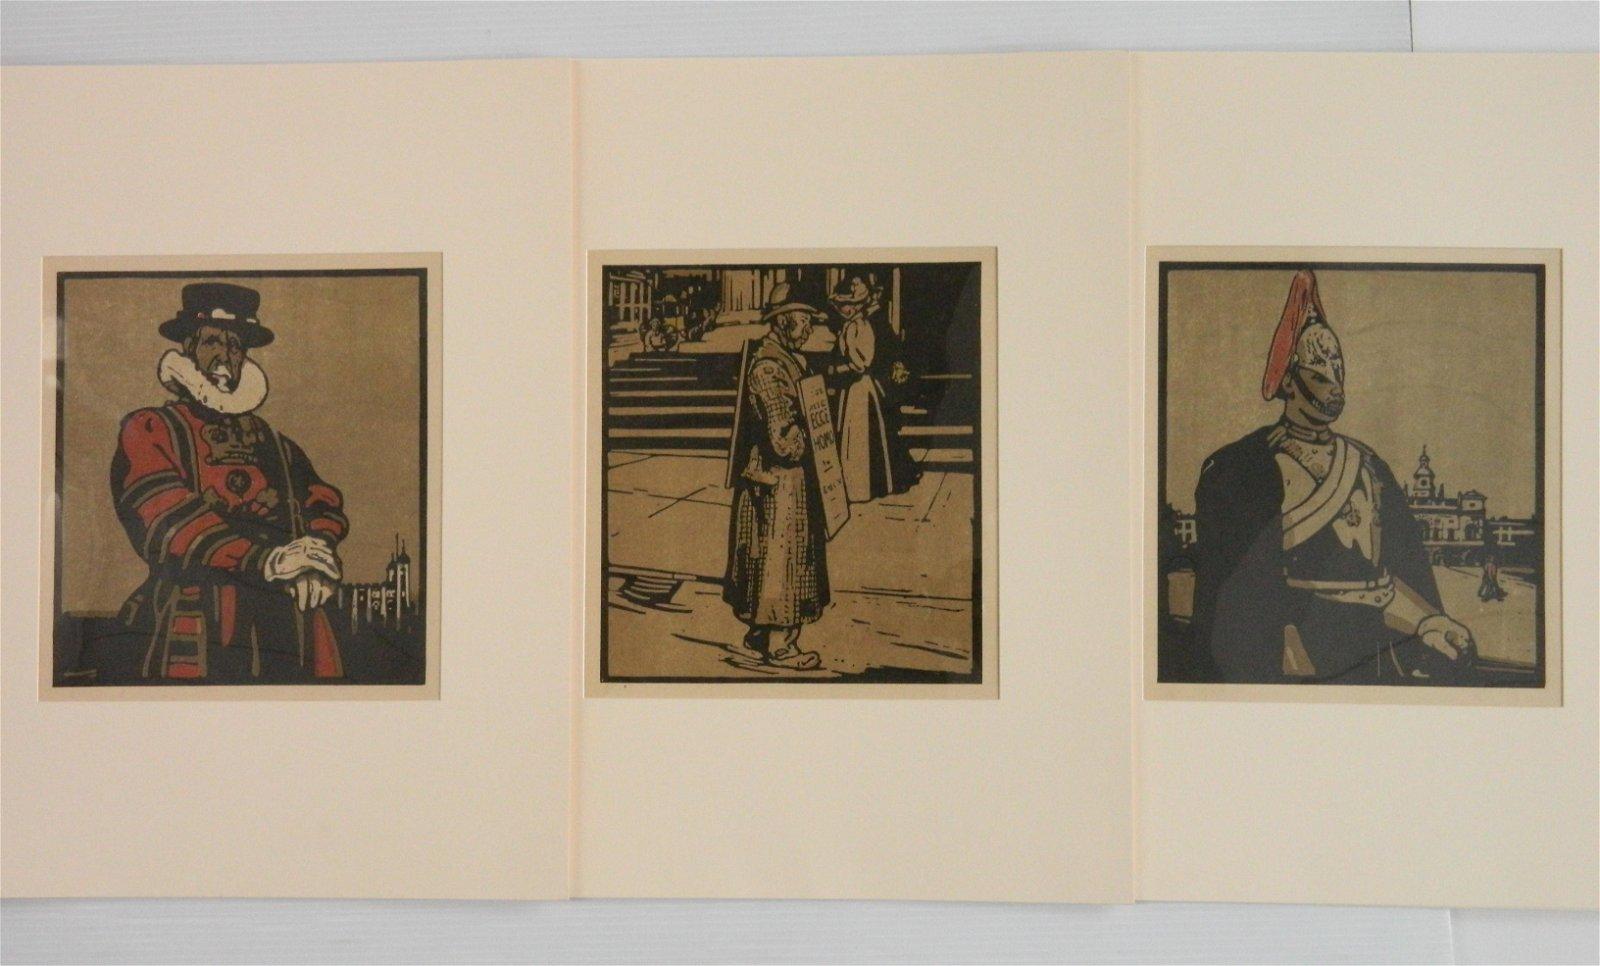 3 William Nicholson lithograph